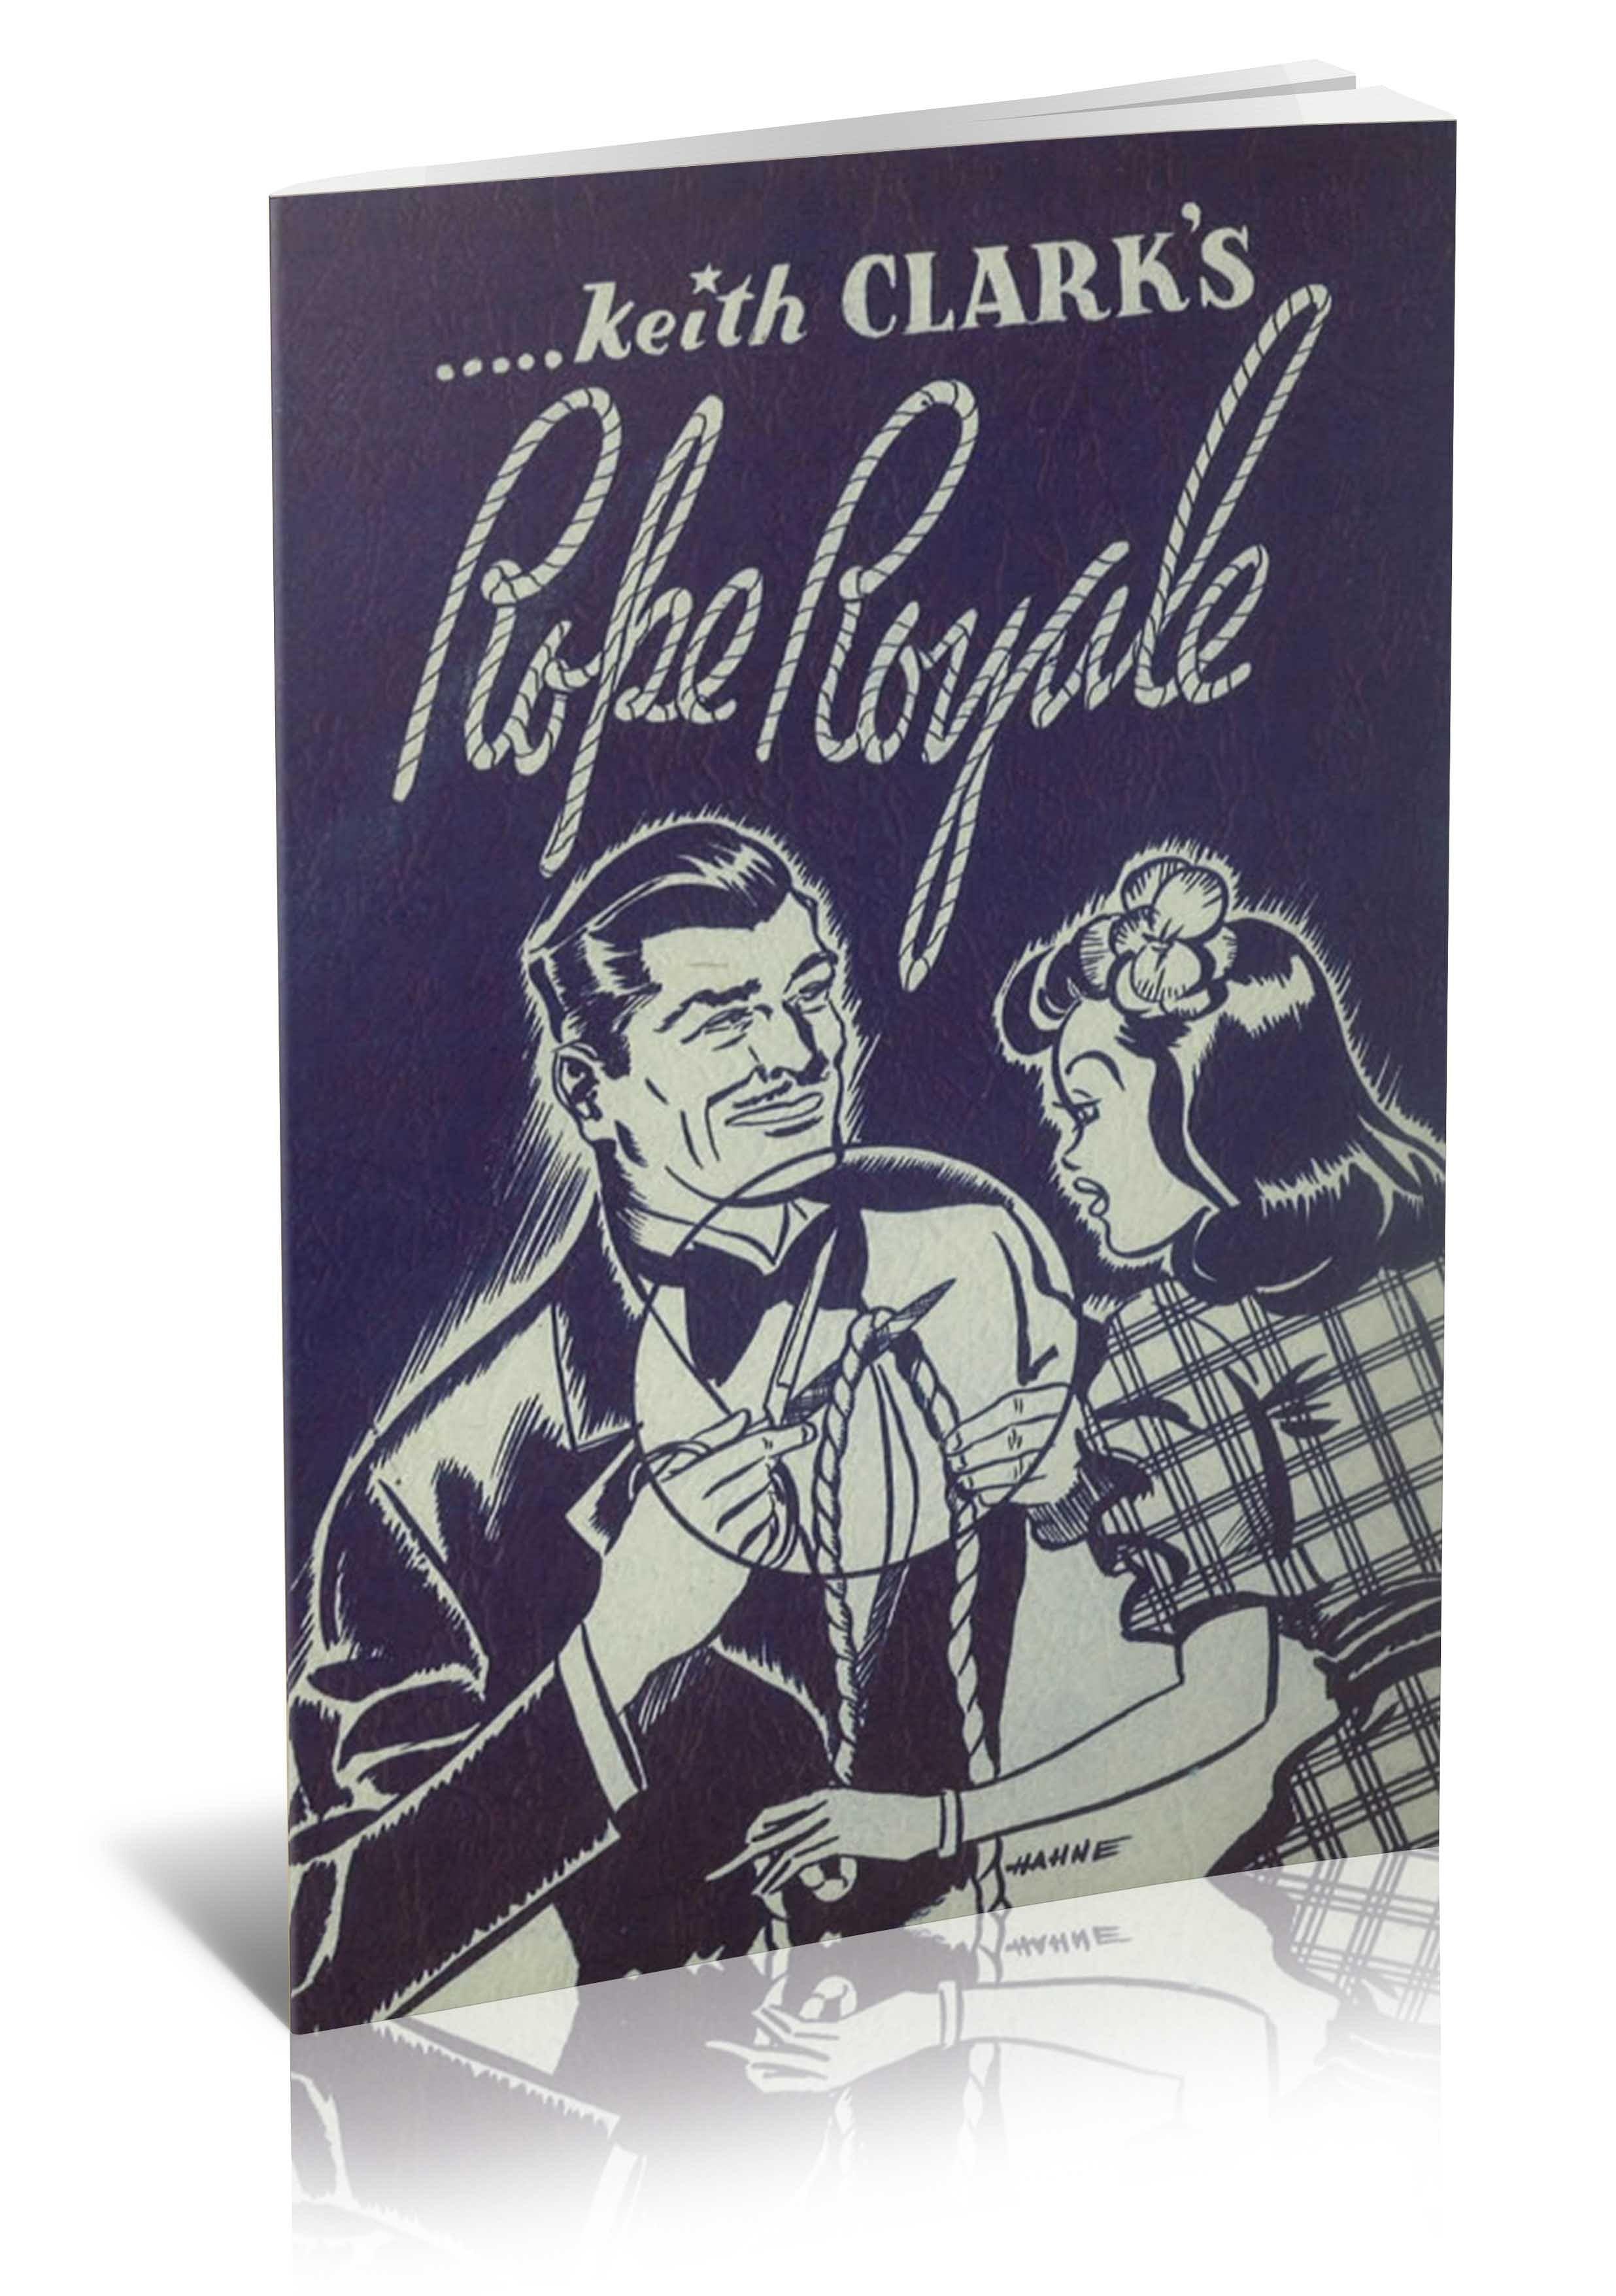 Keith Clark's Rope Royale - magic